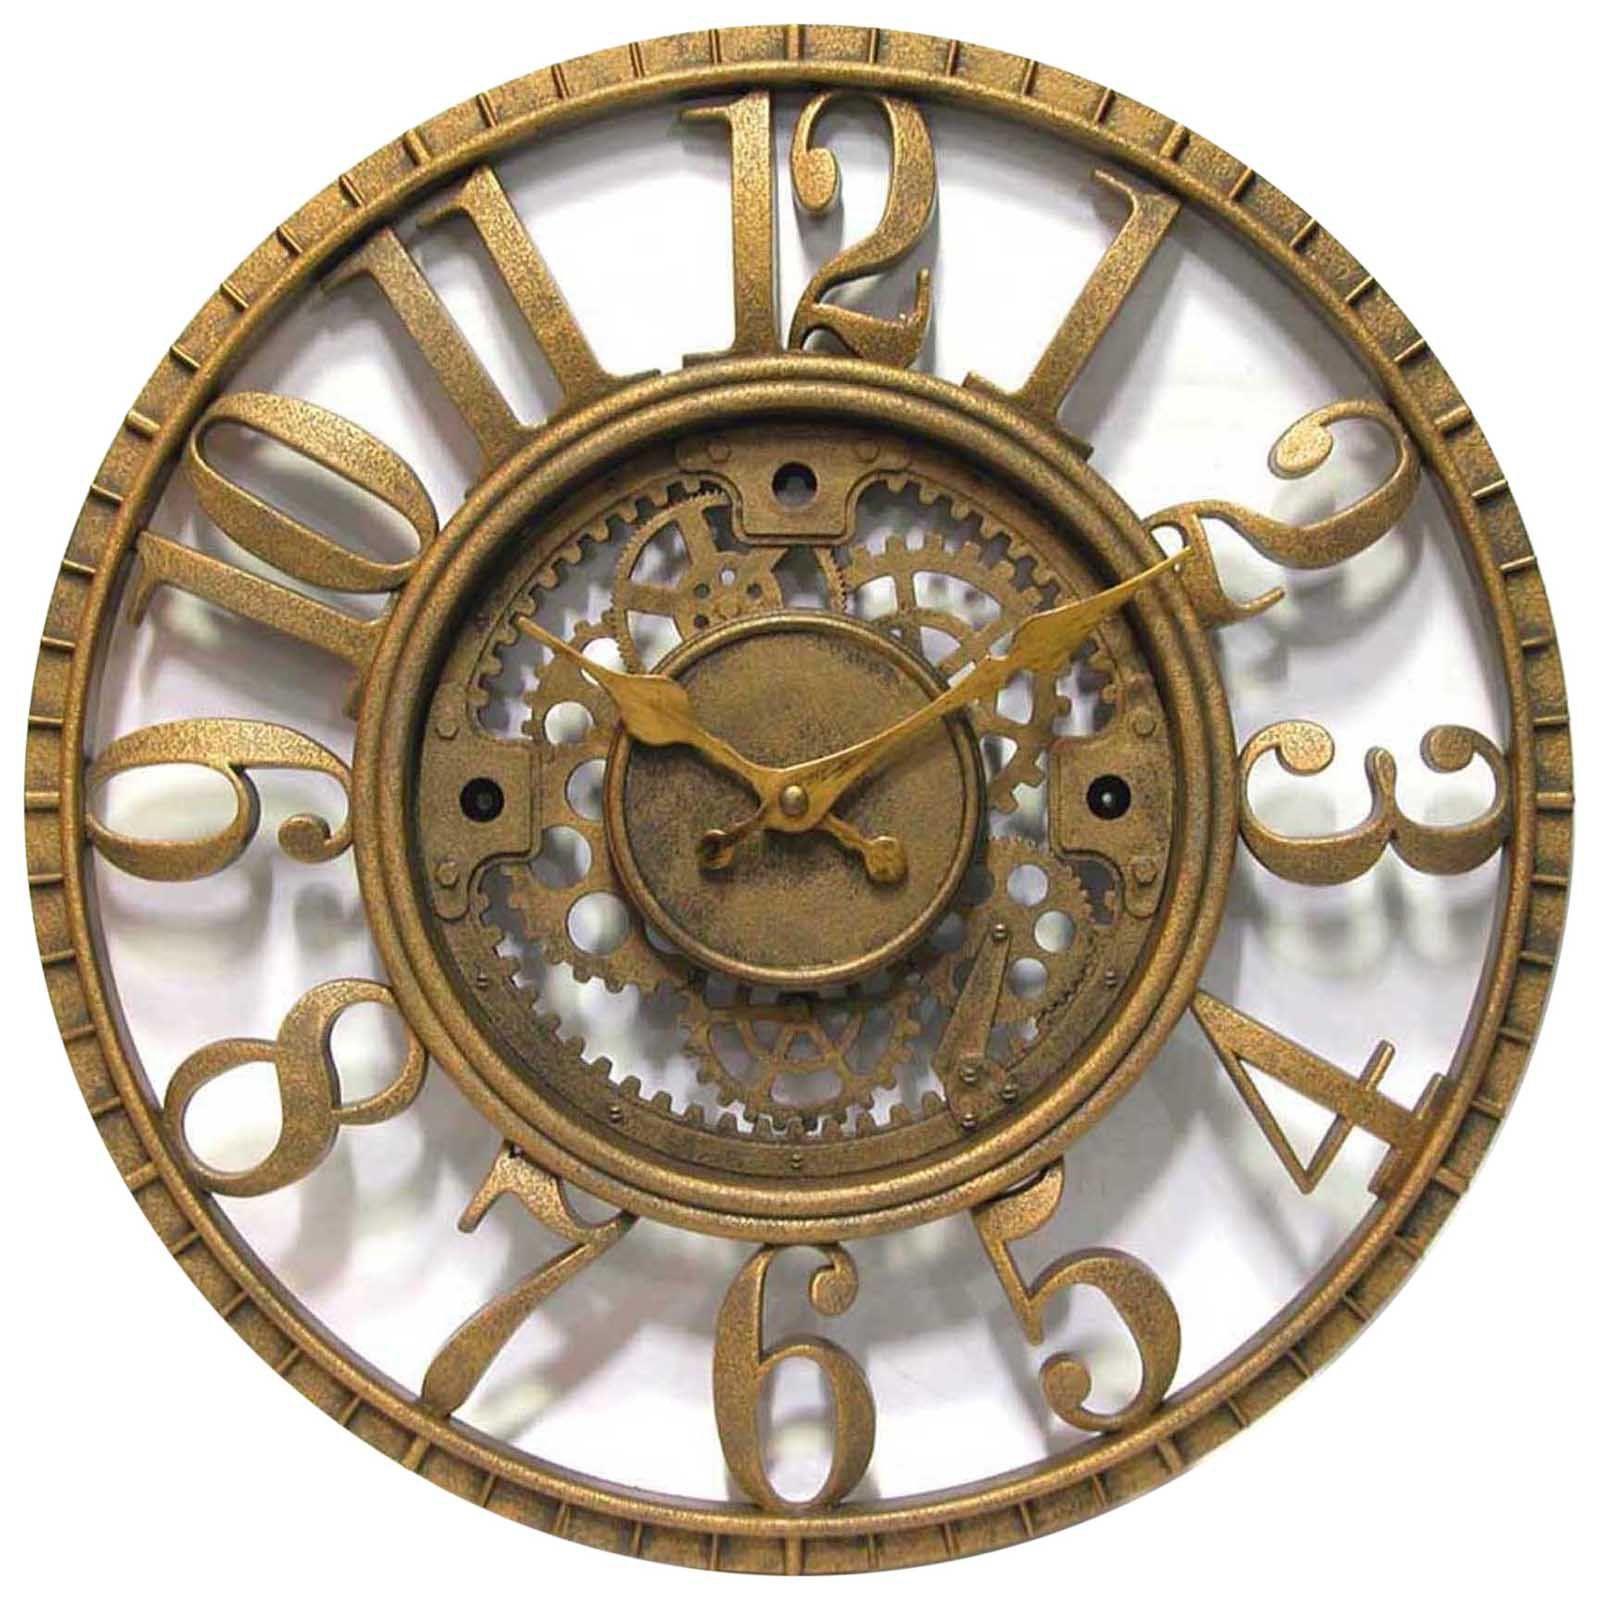 Infinity Instruments Gear Dial 15 5 Inch Wall Clock Www Hayneedle Com Antikvarnye Chasy Dekorativnye Nastennye